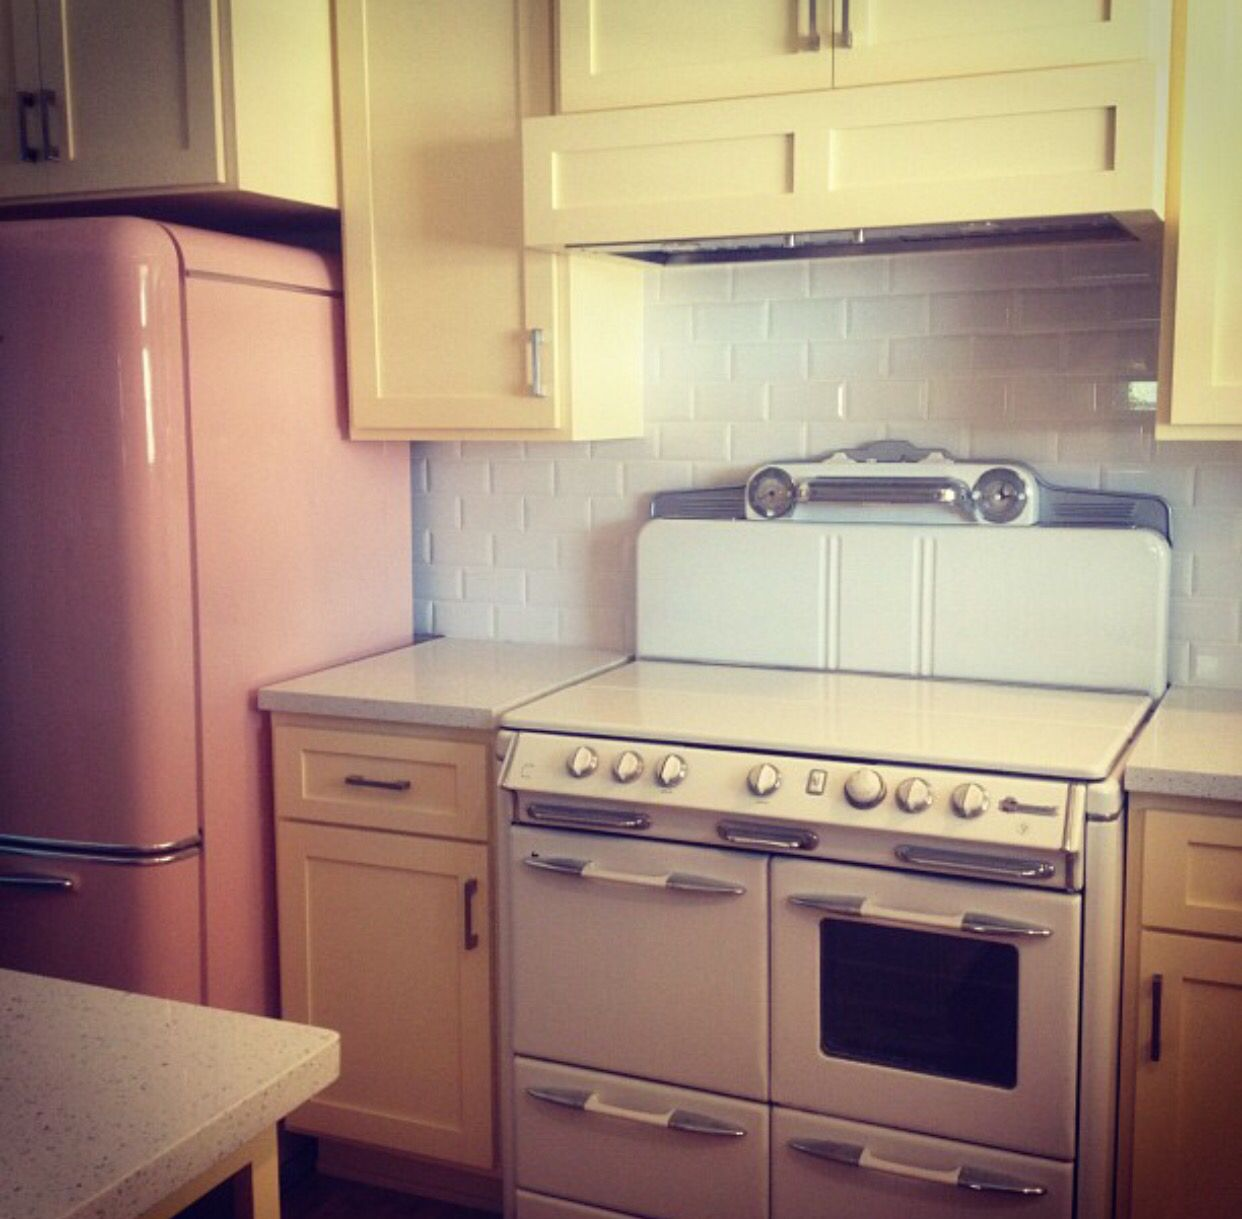 O'keefe & Merritt stove in retro inspired buy new kitchen. Yellow ...